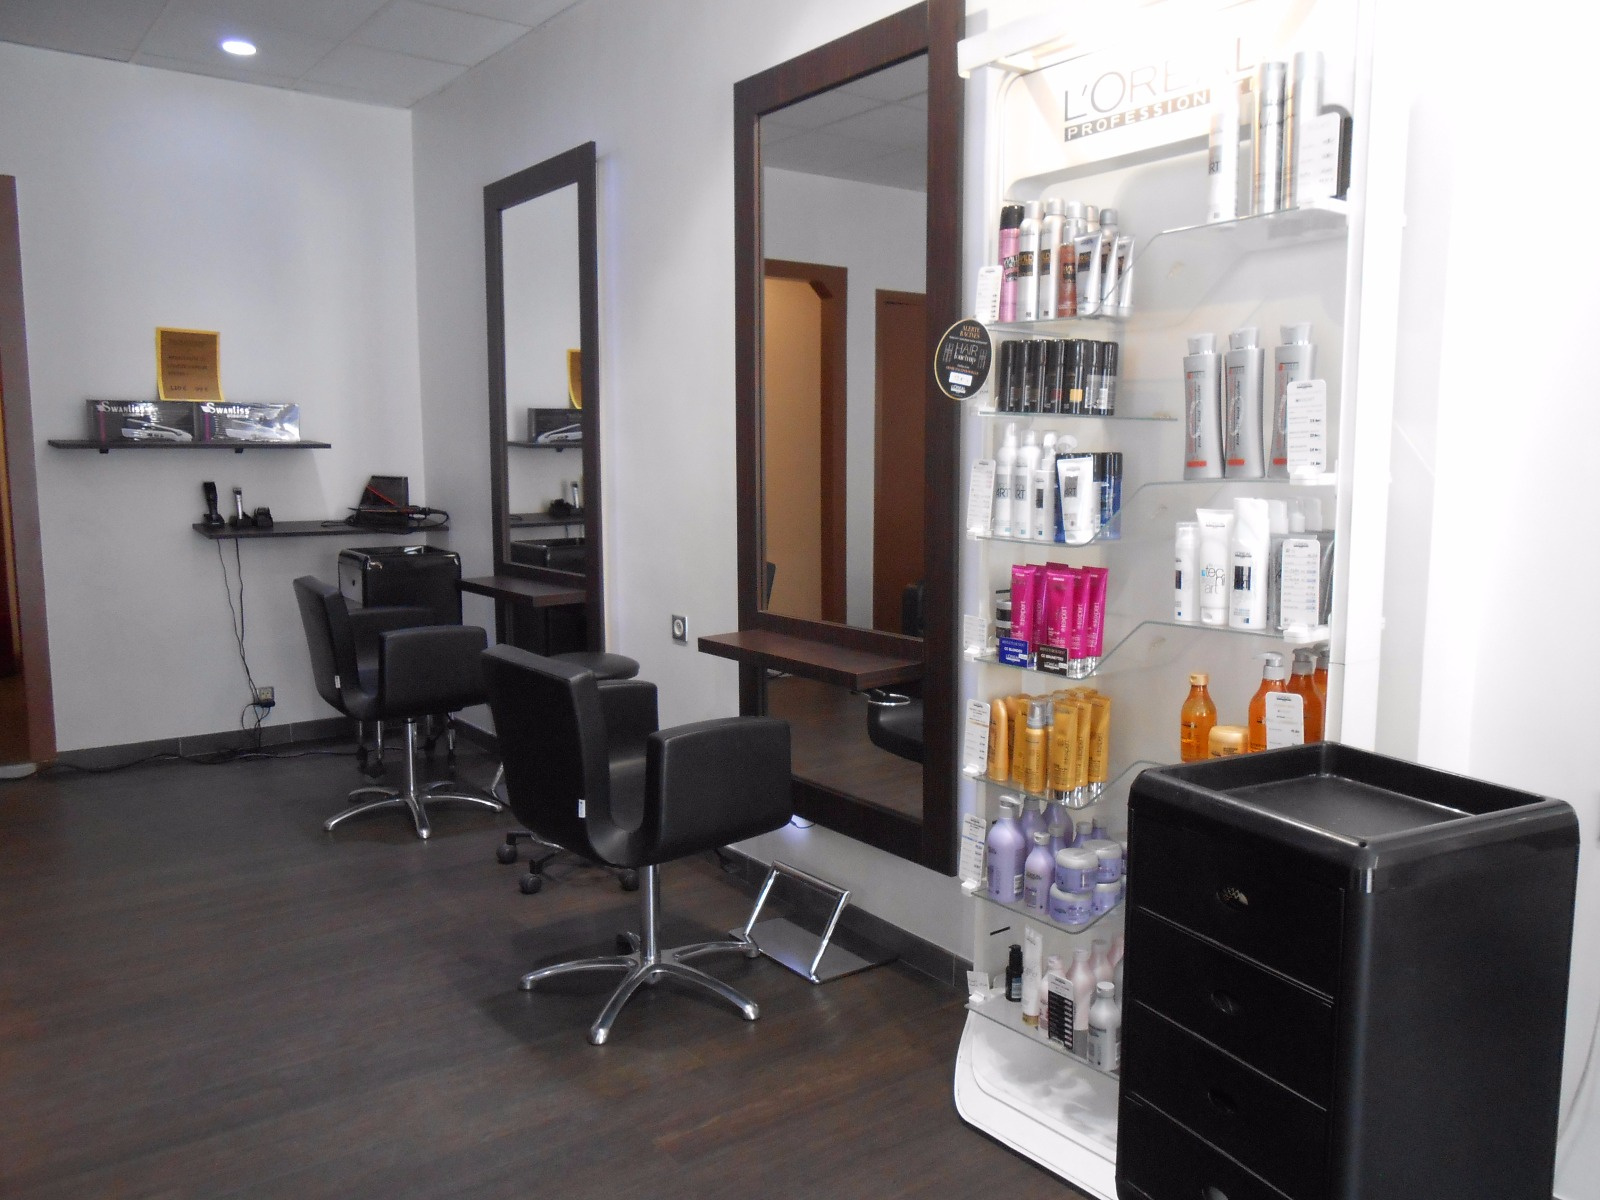 Vente commerce salon de coiffure nice quartier borriglione for Salon de the nice